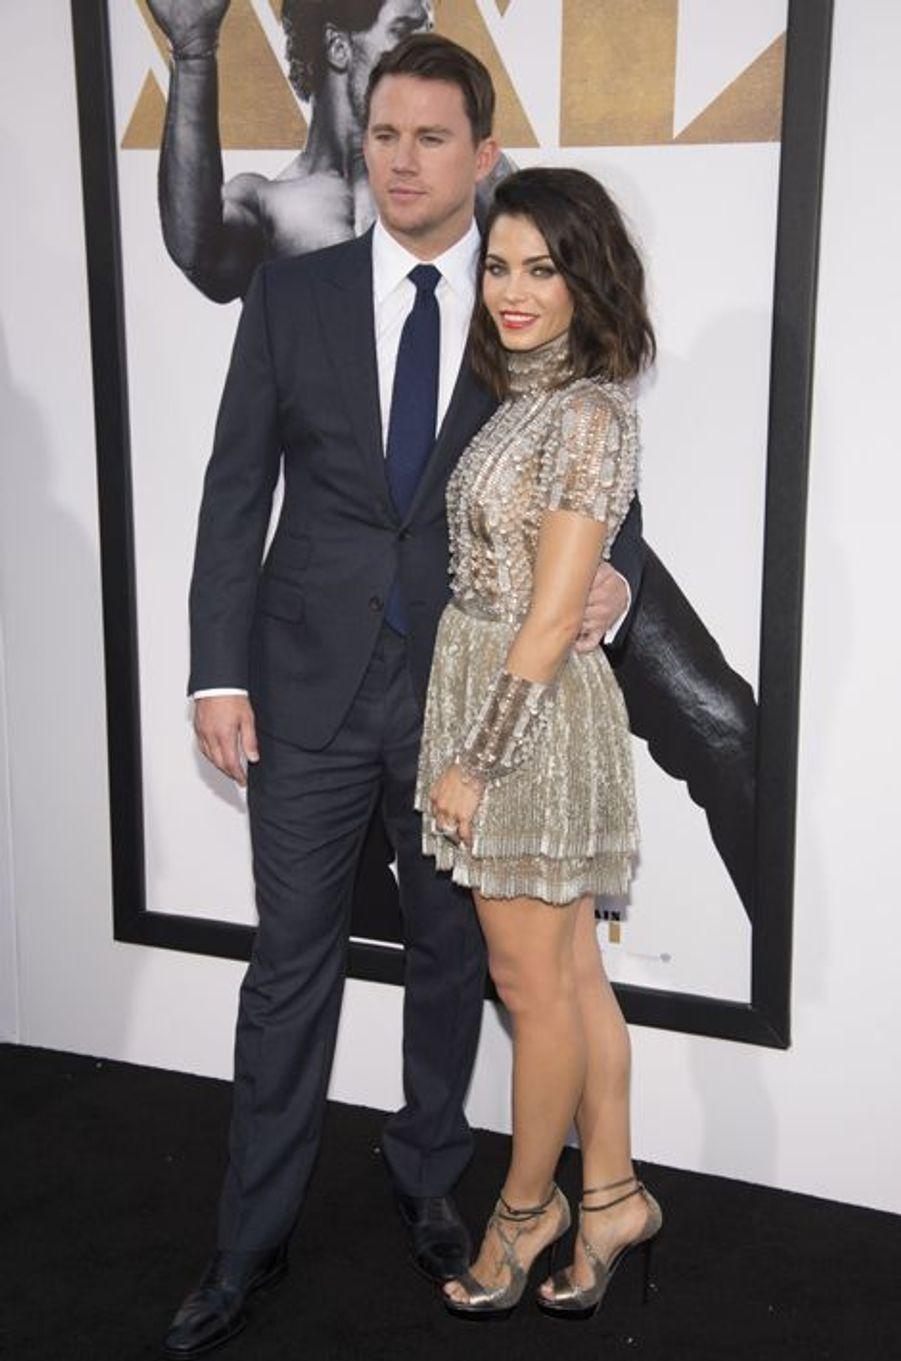 Channing Tatum et sa compagne Jenna Dewan